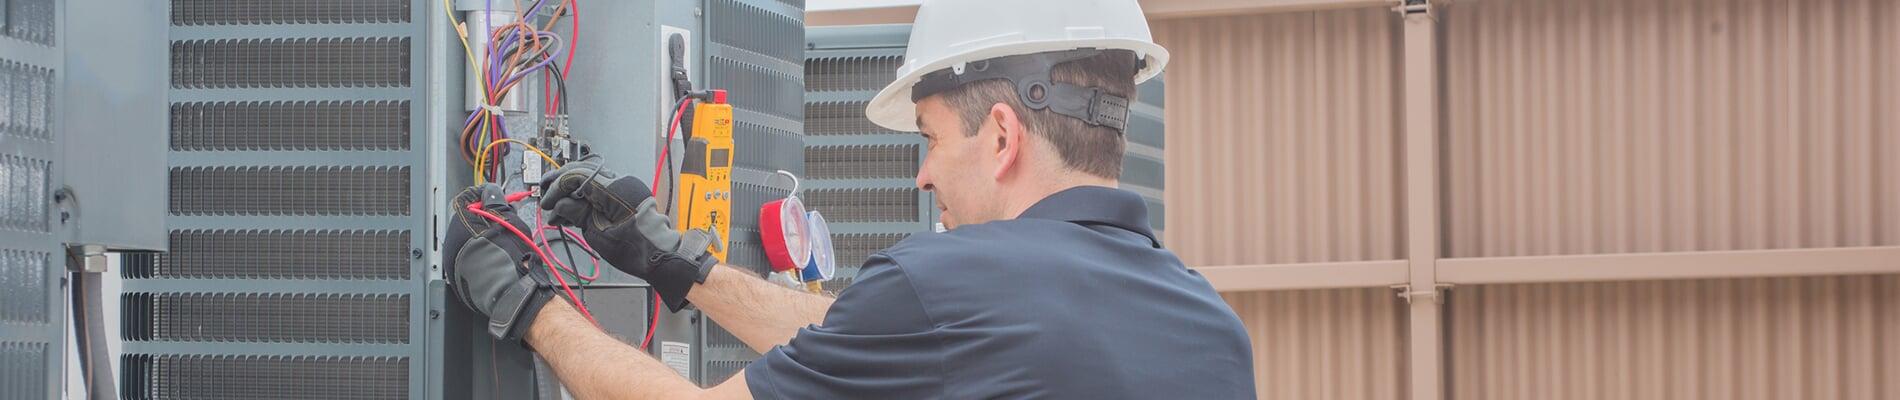 Bergmann Heating & Air Conditioning image 0